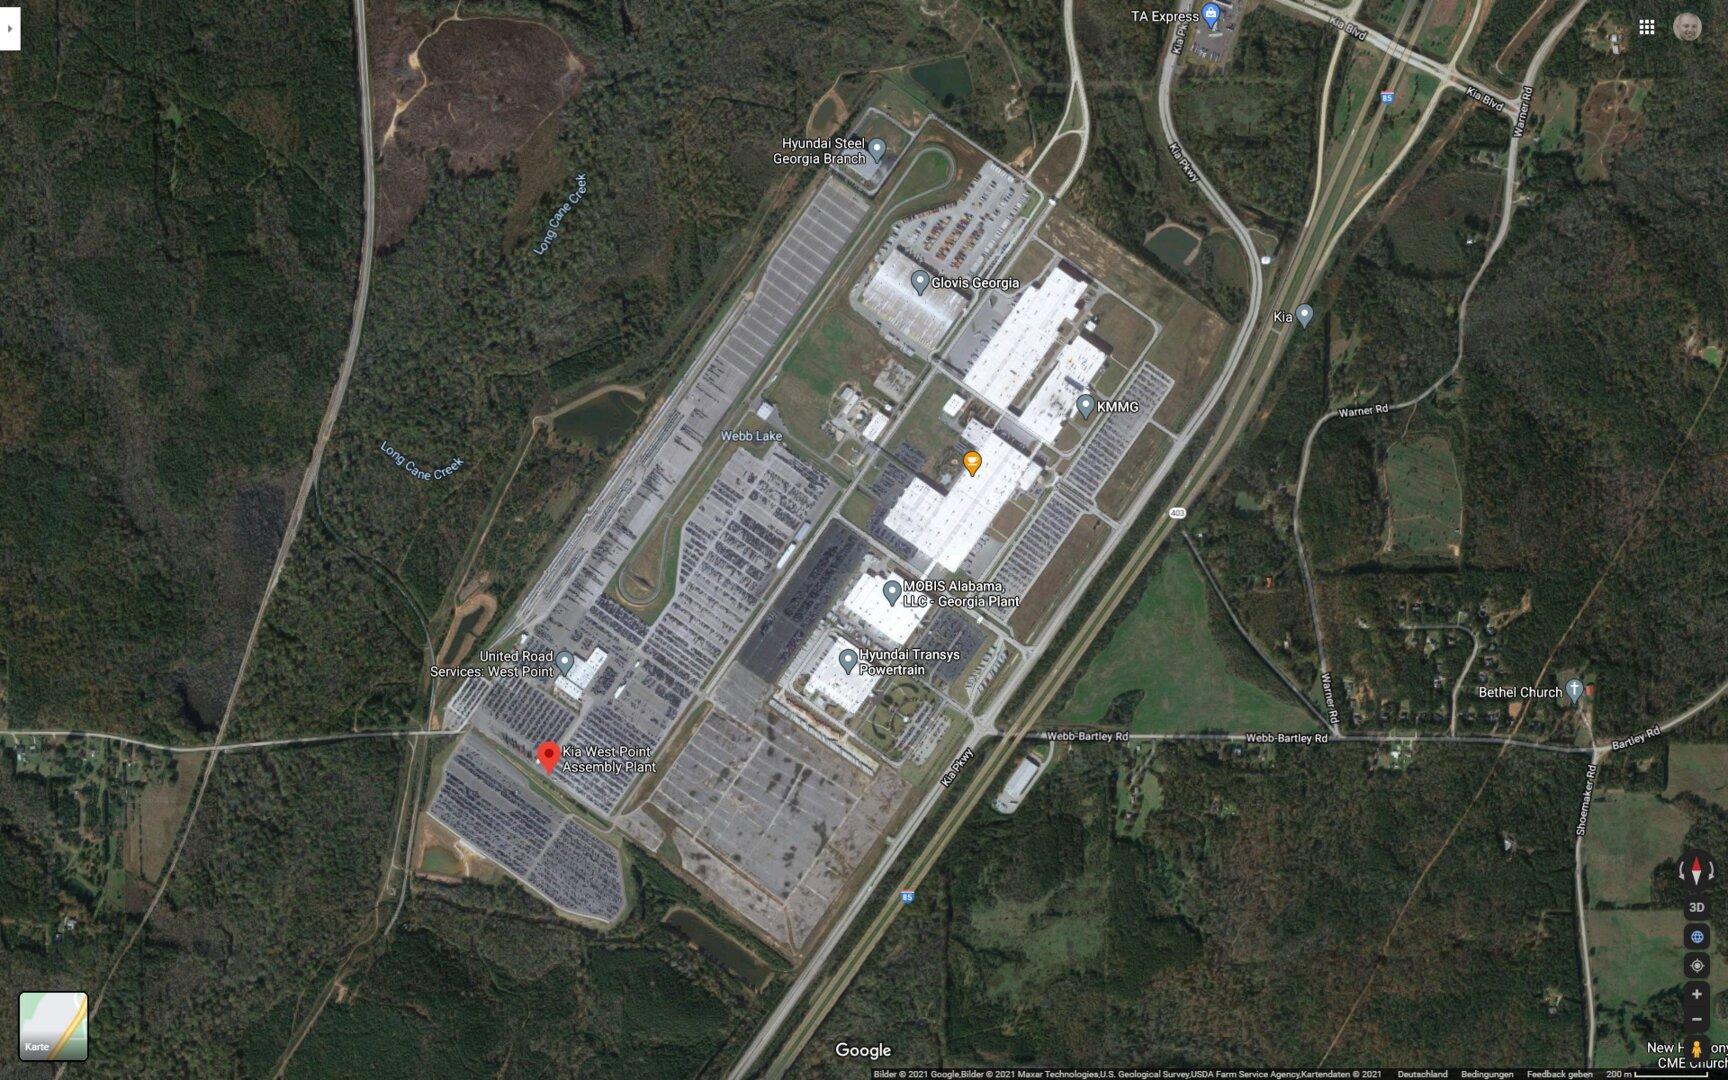 Kia West Point Assembly Plant in Georgia